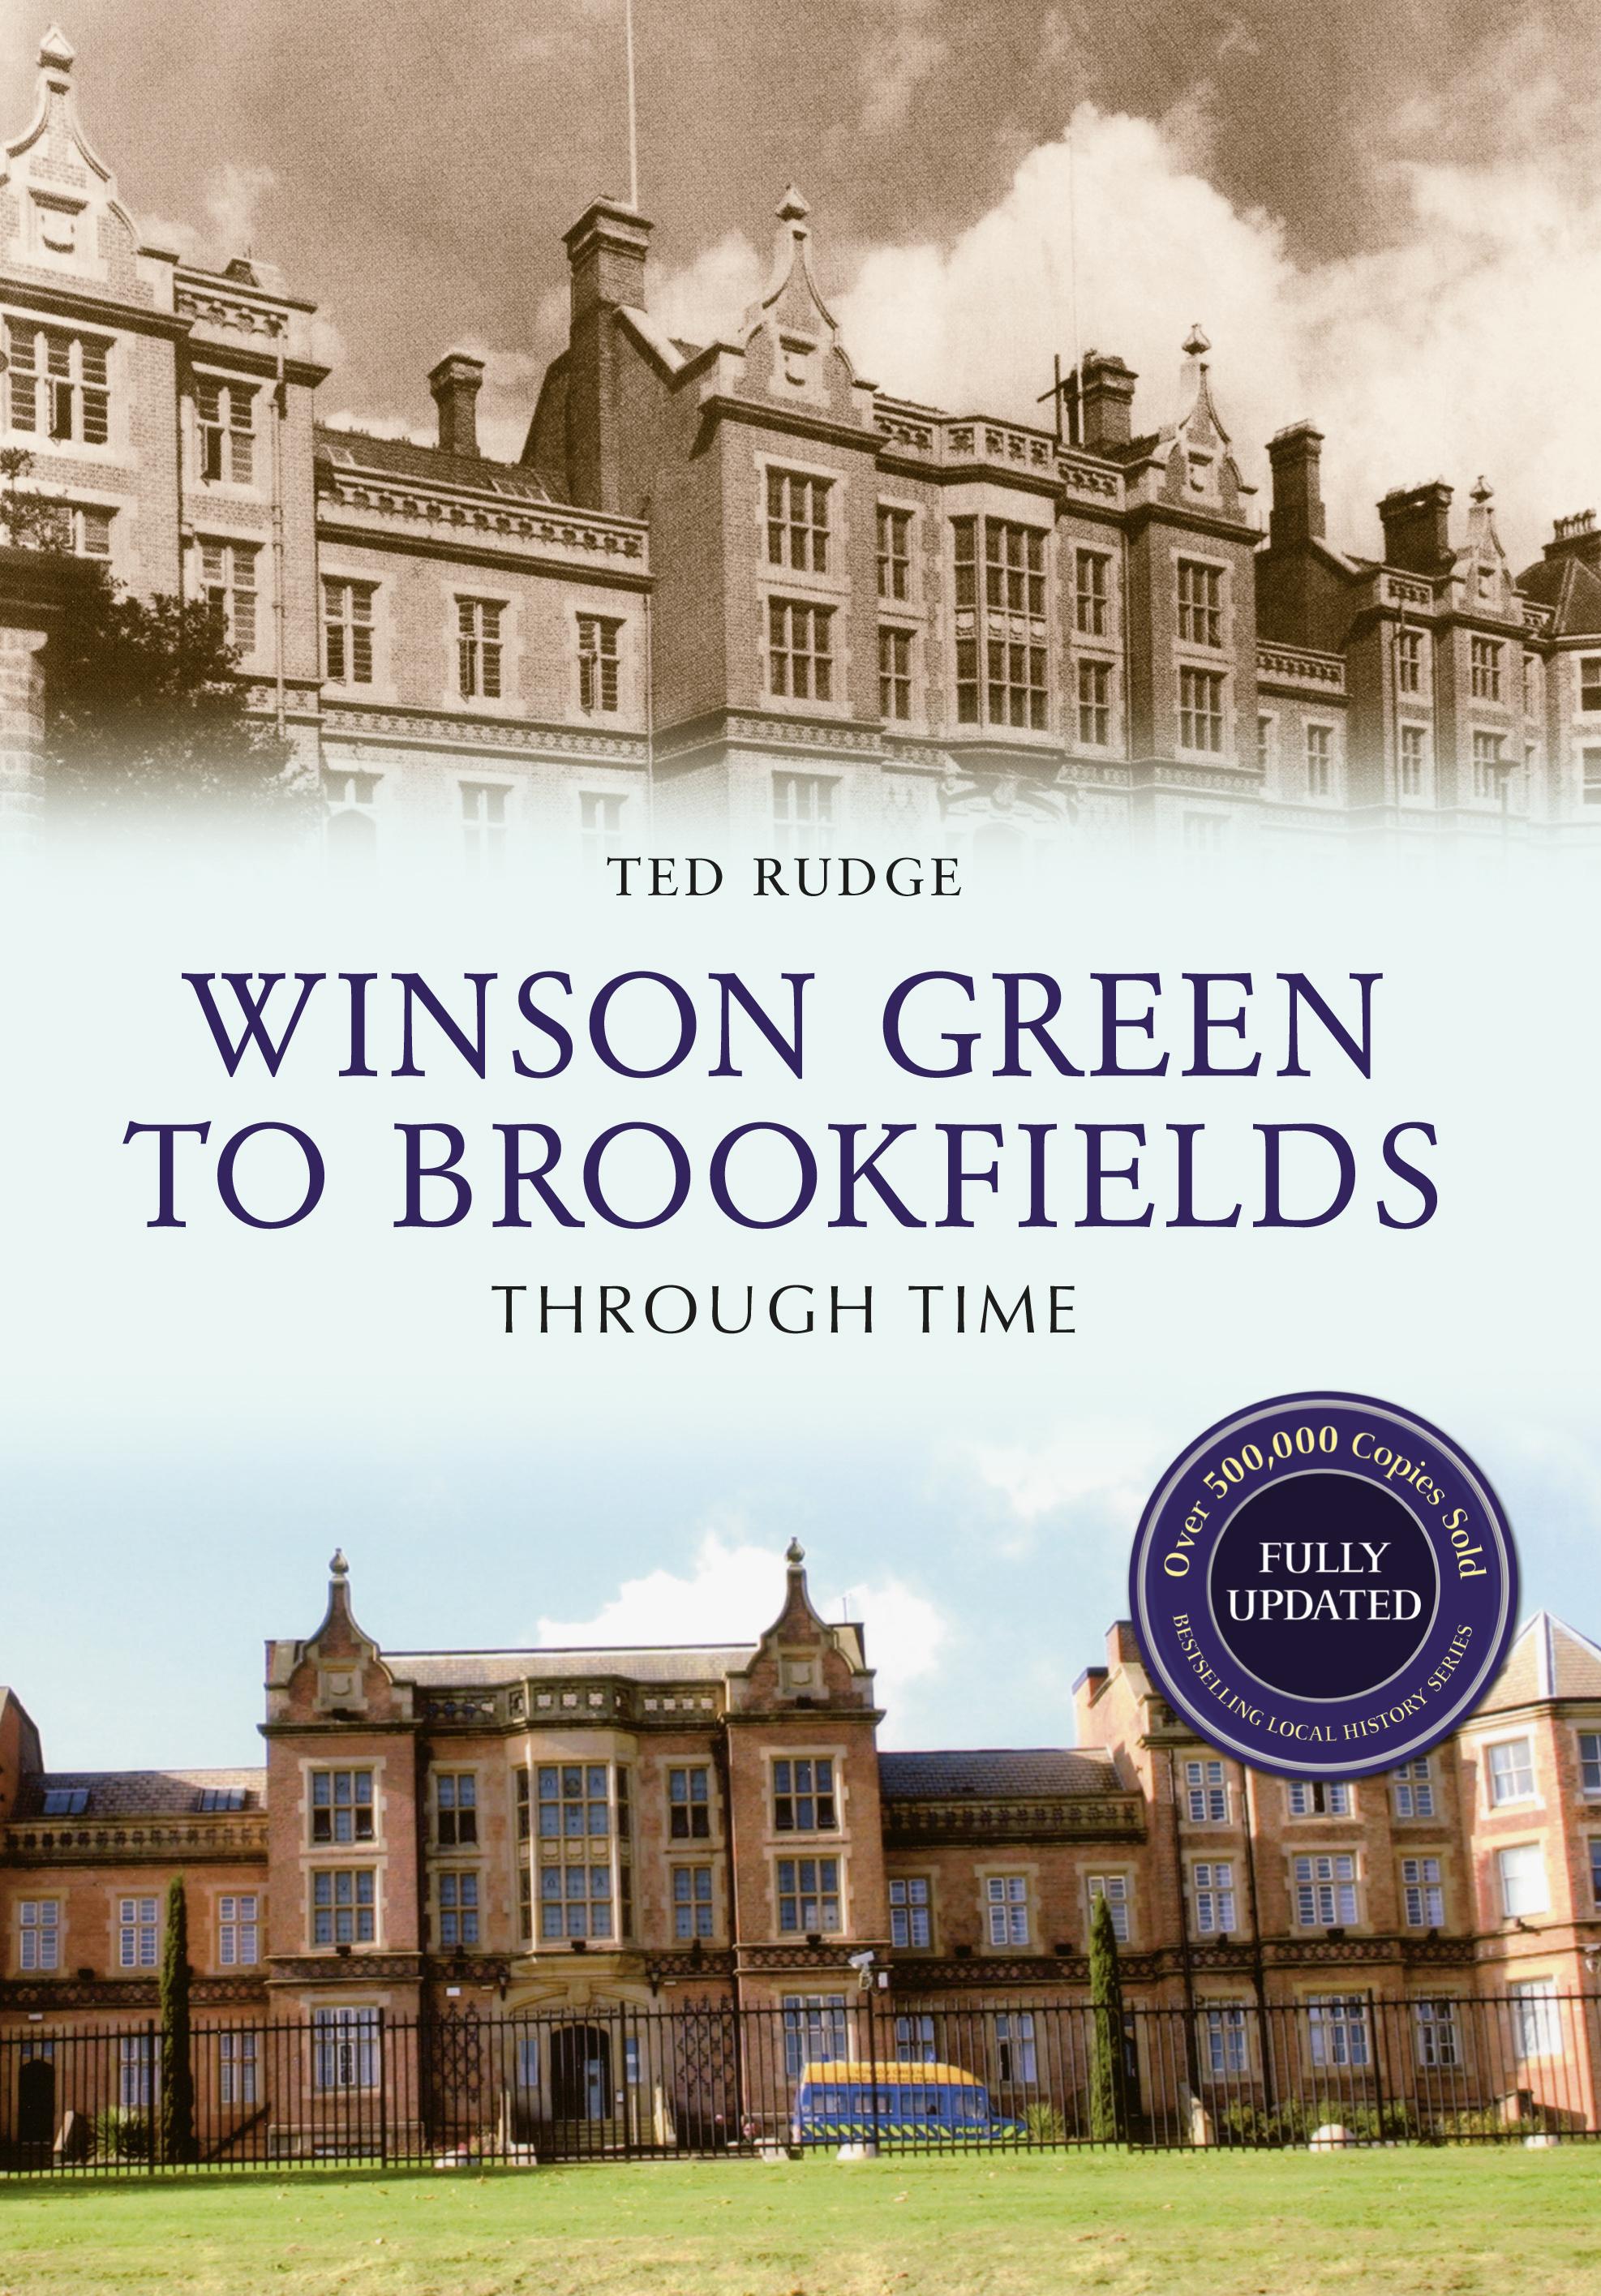 Winson Green cover copy.jpg